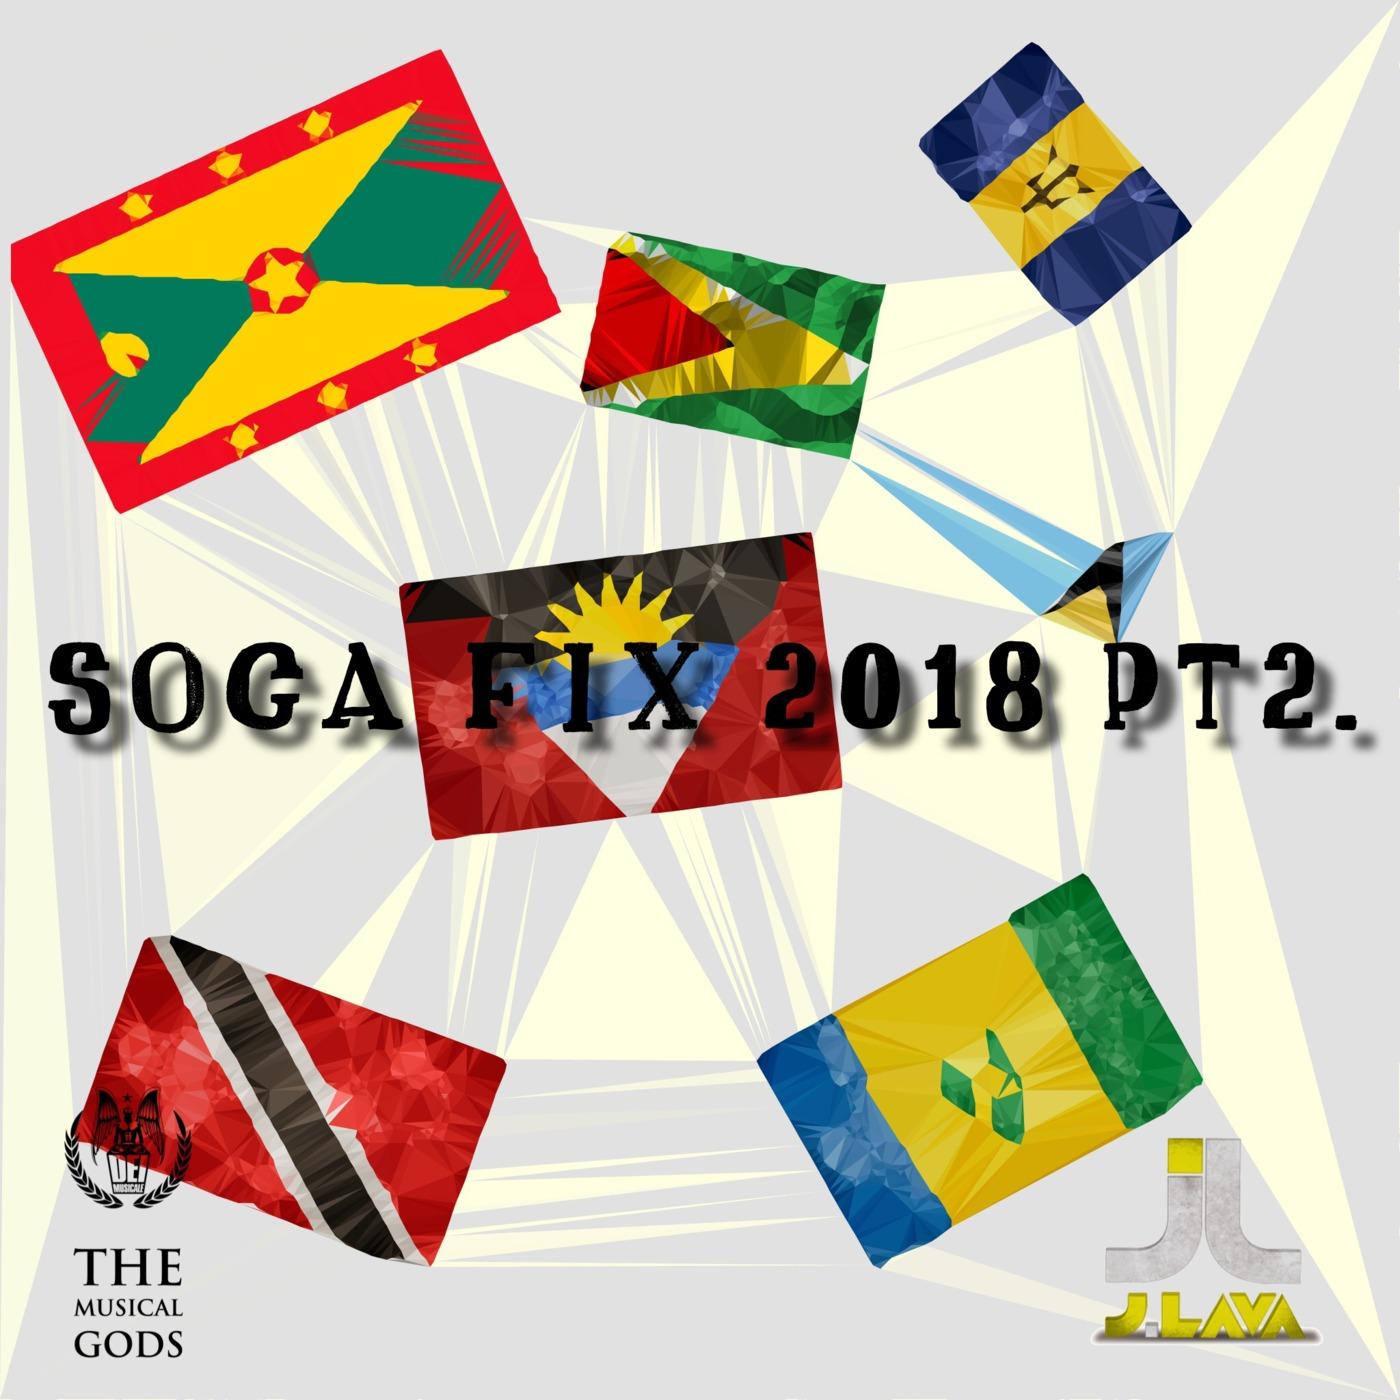 SOCA FIX 2018 PT2 - Dei Musicale : The Musical Gods Podcast